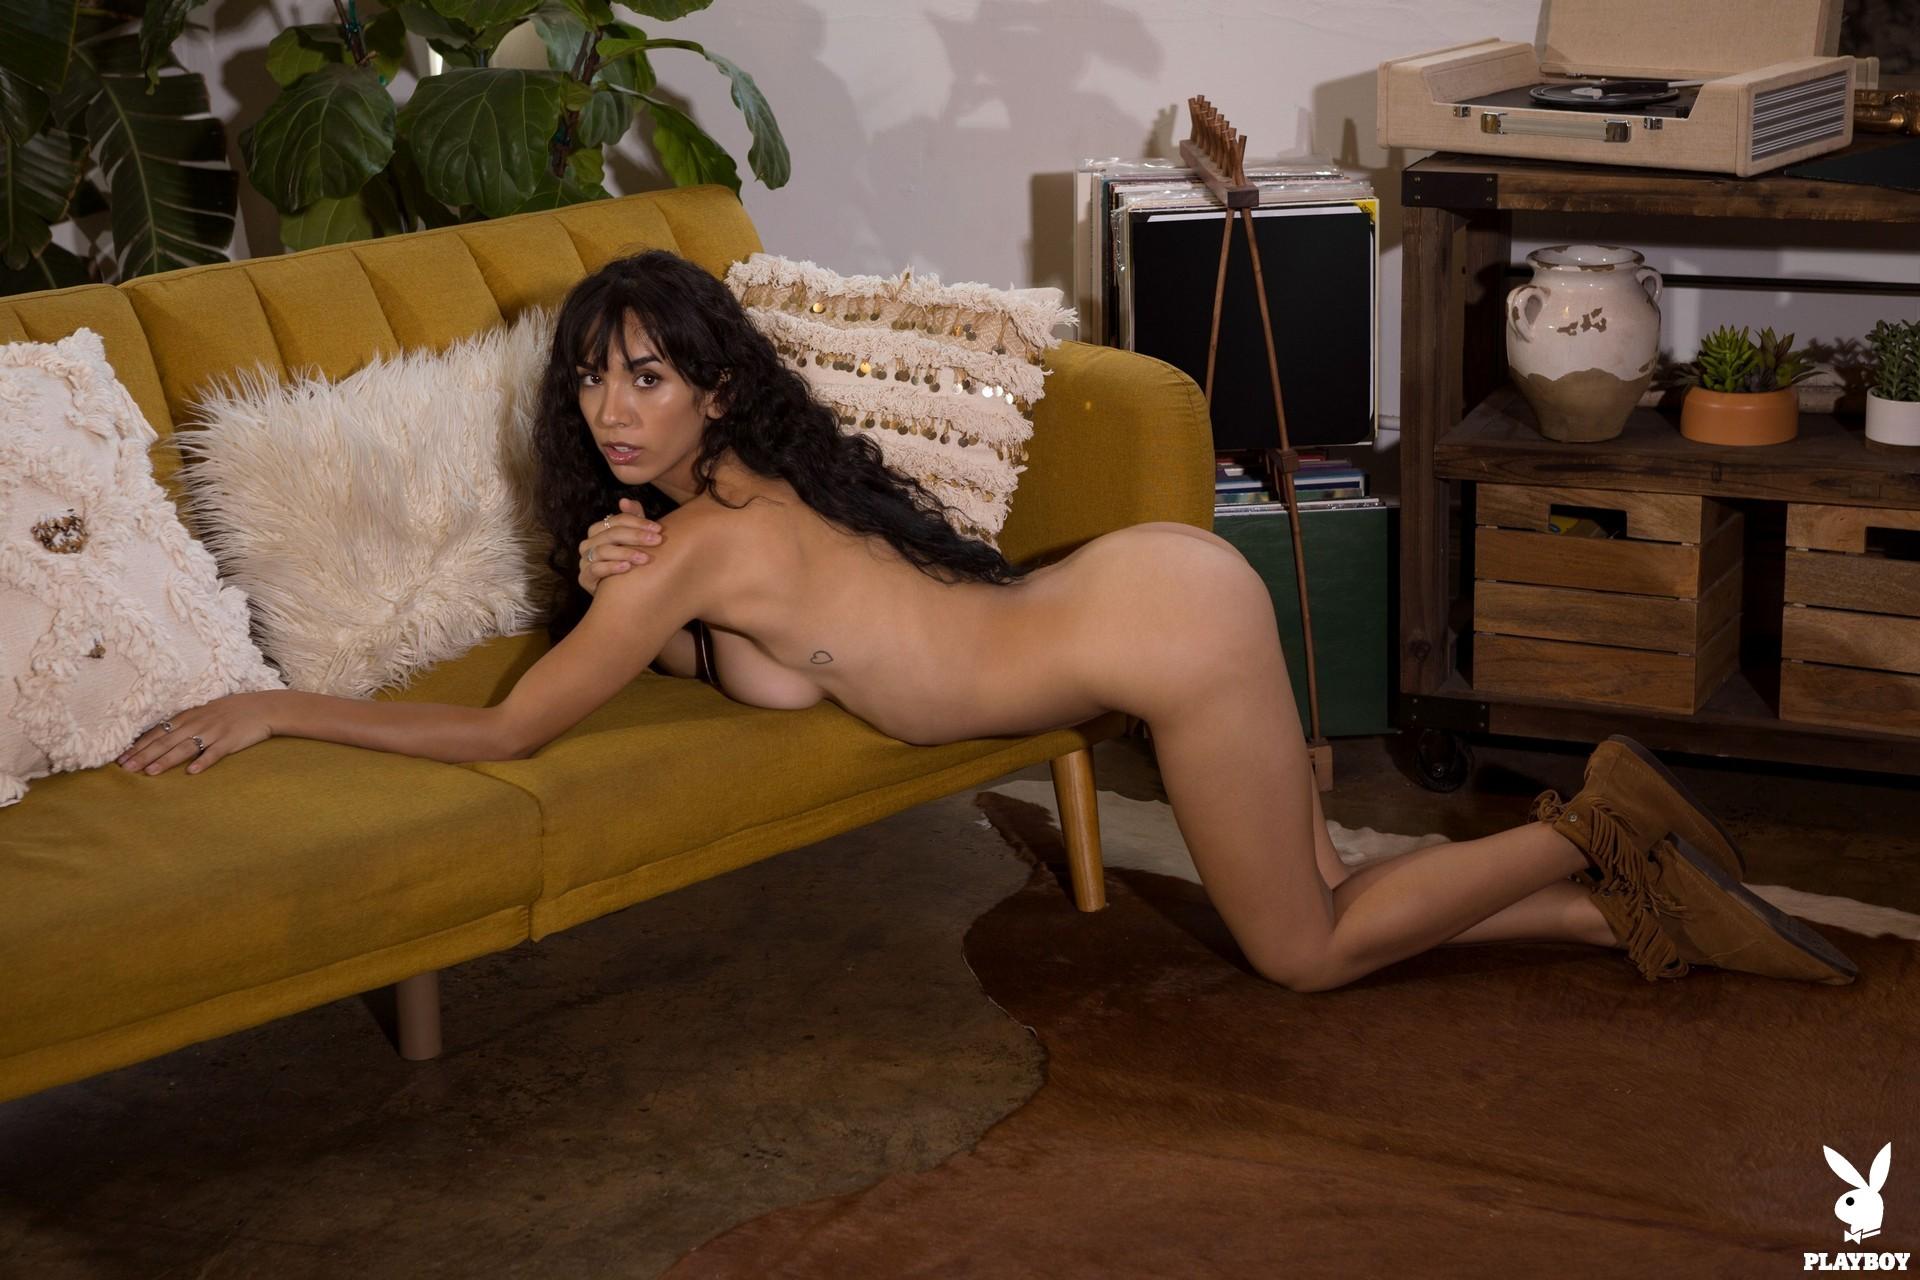 Erika De Leija in Funky and Free - Playboy Plus 35